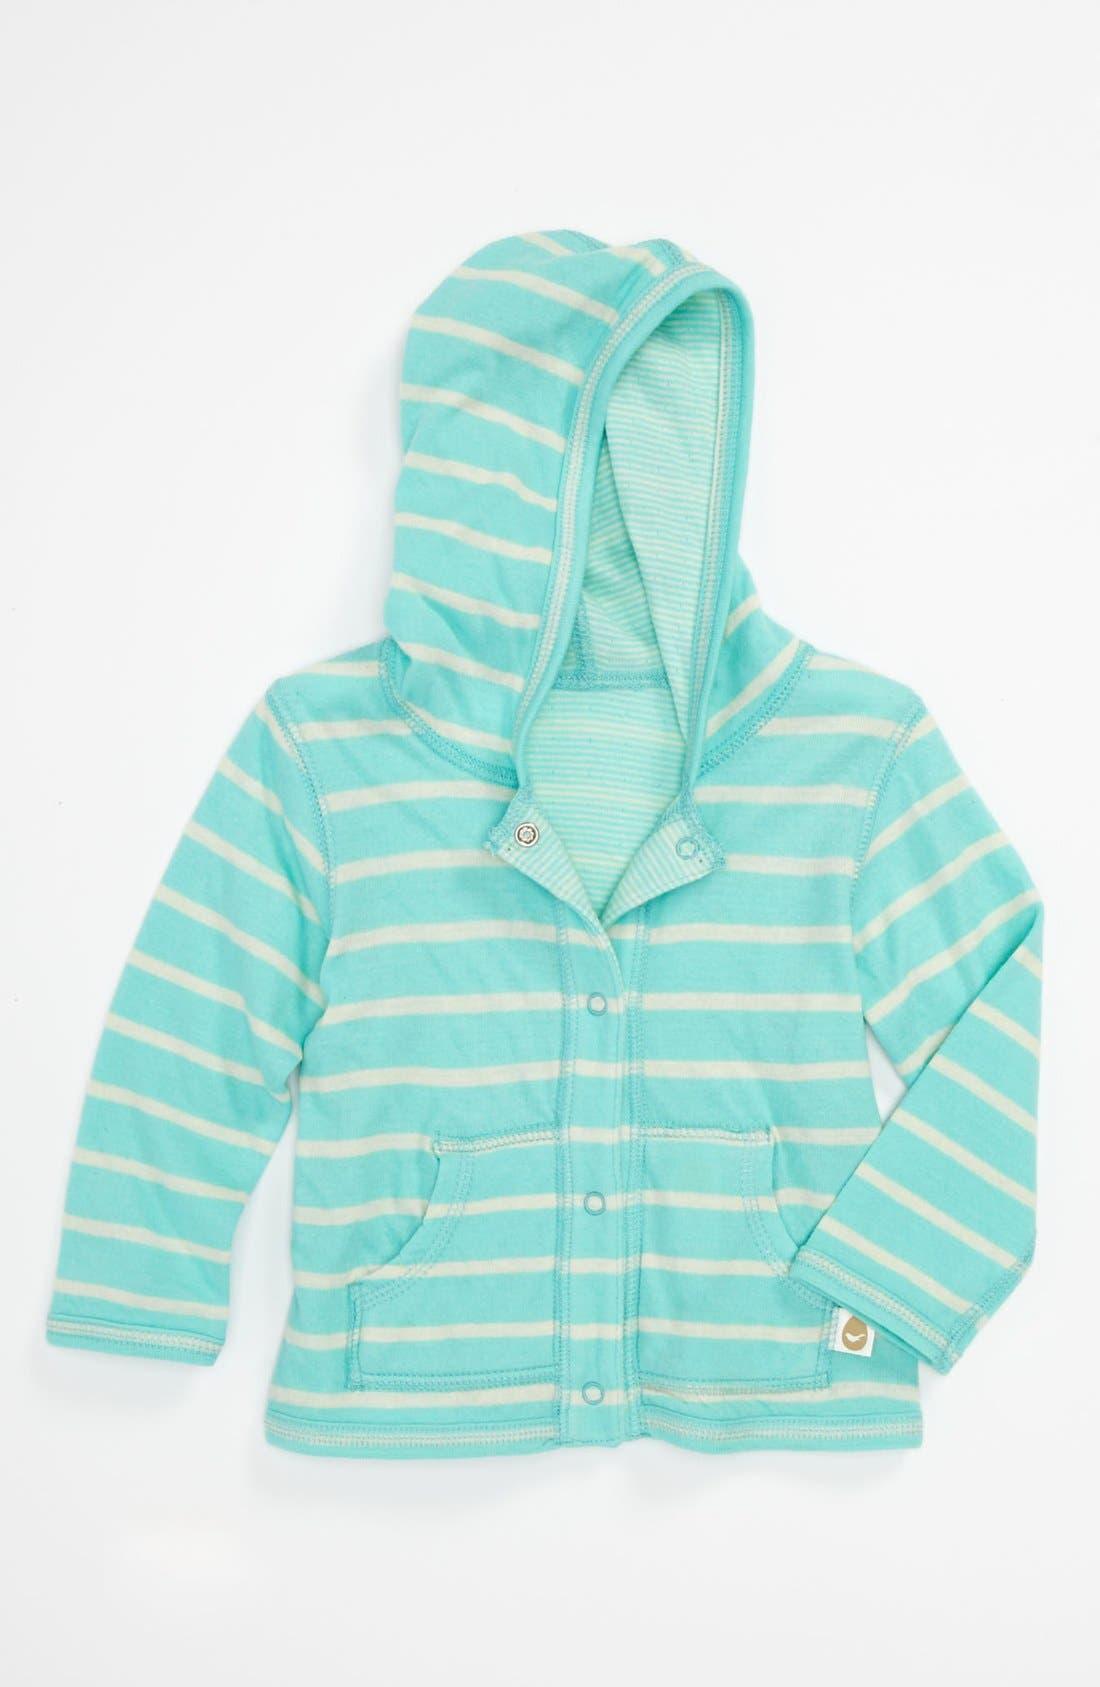 Main Image - Stem Baby Summer Organic Cotton Reversible Hoodie (Baby)